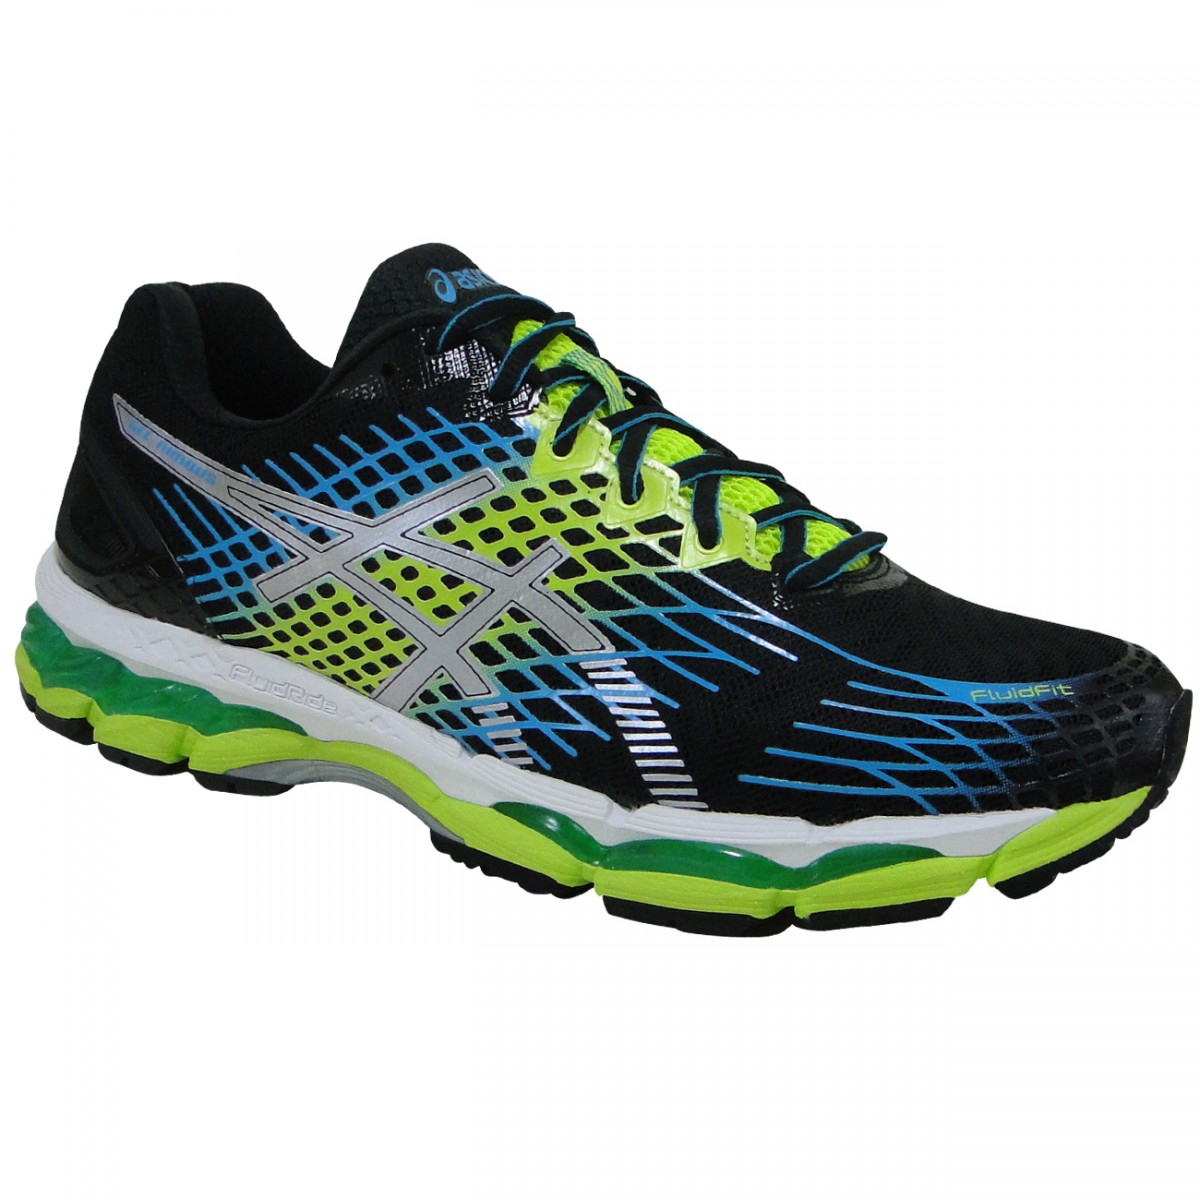 5c9df5f1588d5 Tenis Asics Gel-Nimbus 17 T507N 9901 - Preto Verde Branco - Chuteira Nike